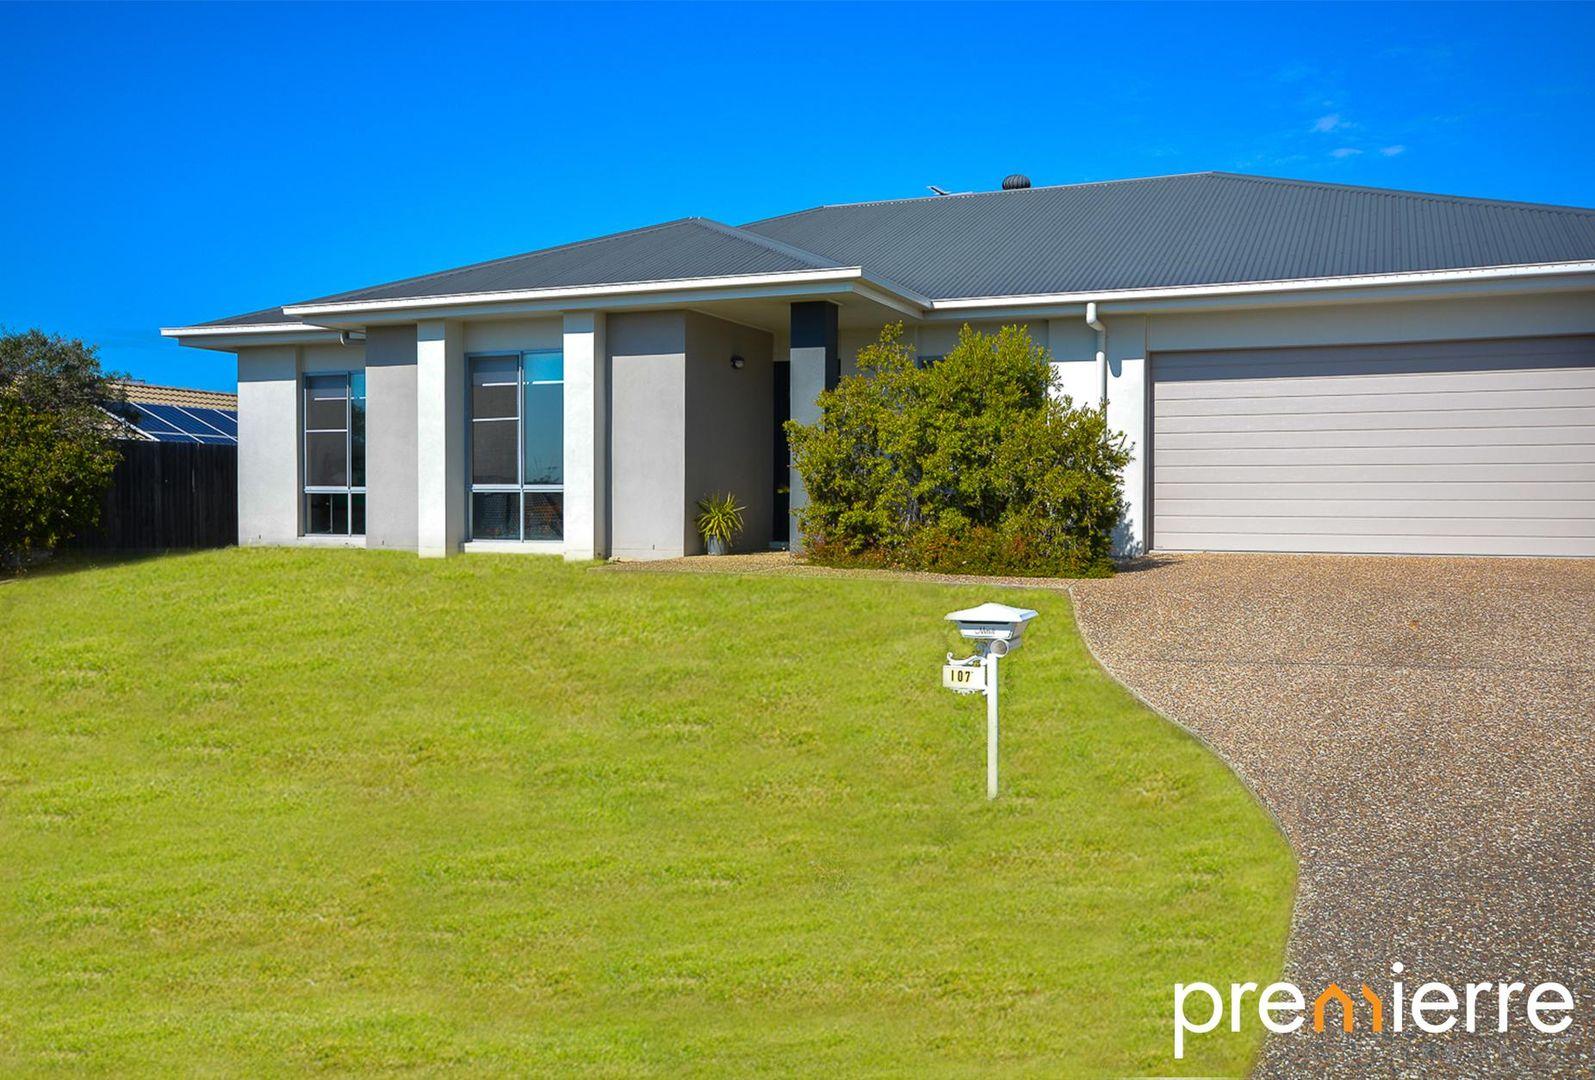 107 Whitmore Crescent, Goodna QLD 4300, Image 1